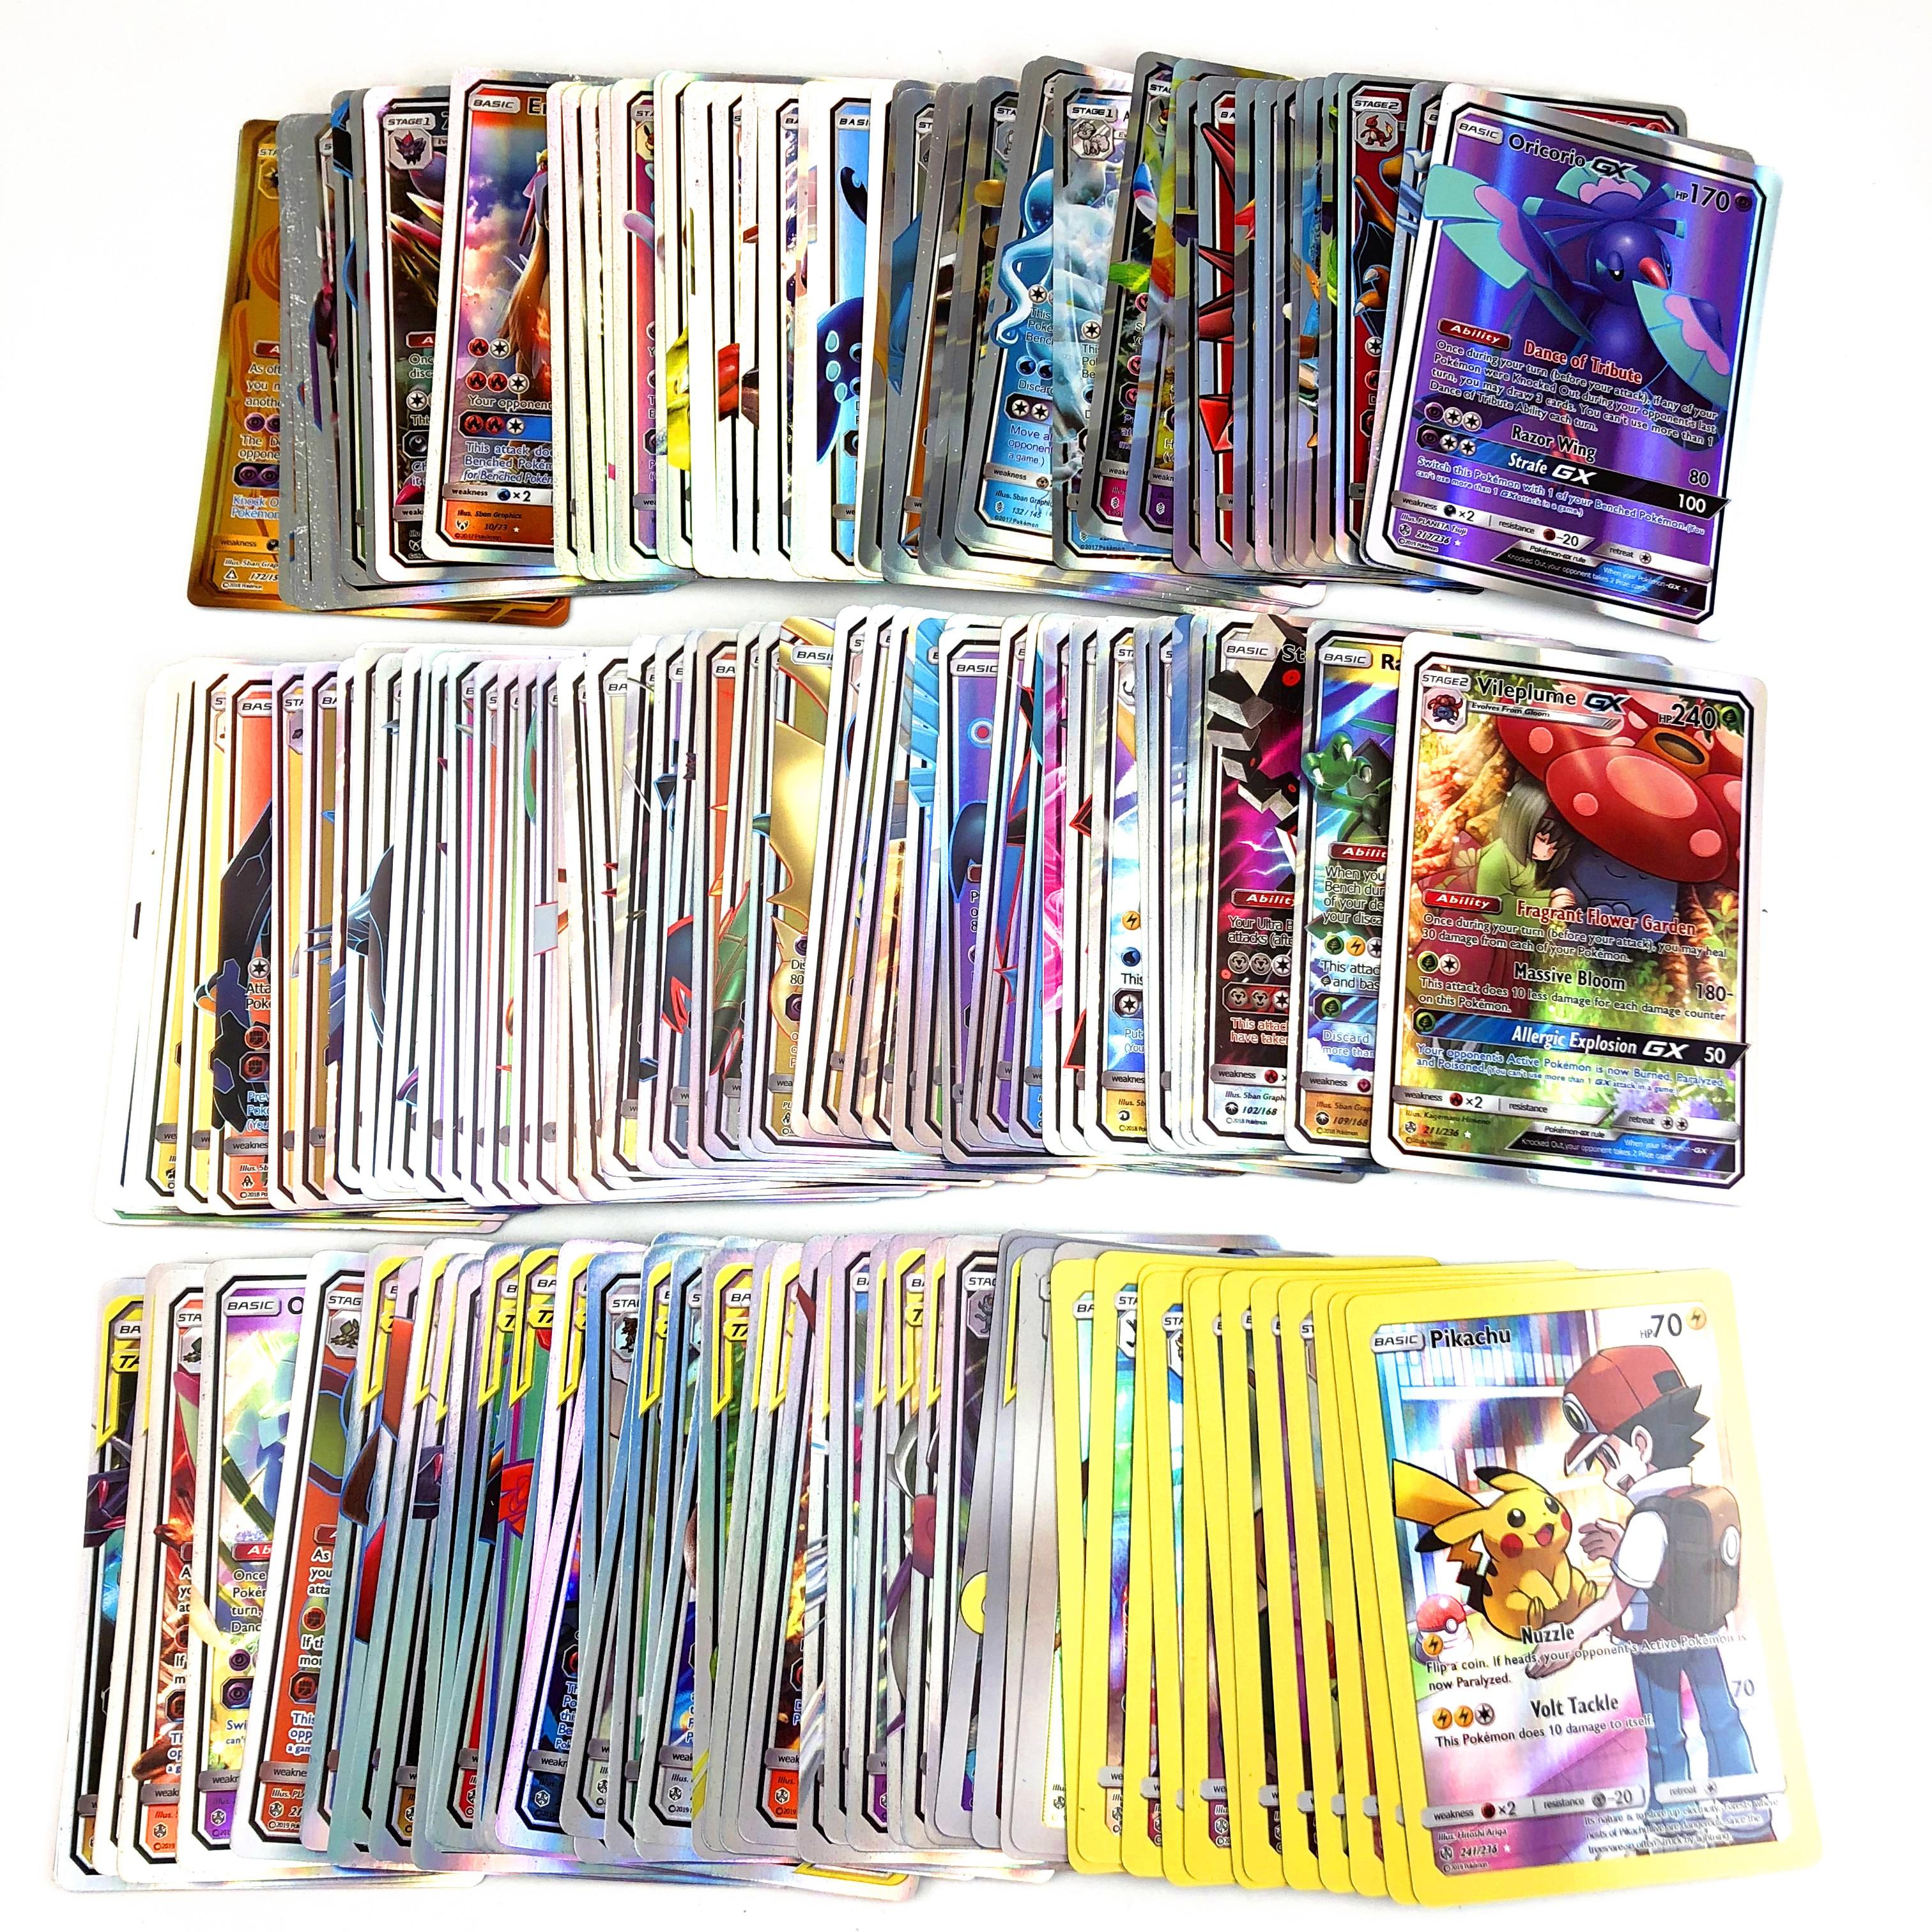 300-pcs-no-repeat-font-b-pokemones-b-font-card-gx-tag-team-ex-mega-shinny-card-game-battle-carte-trading-children-toy